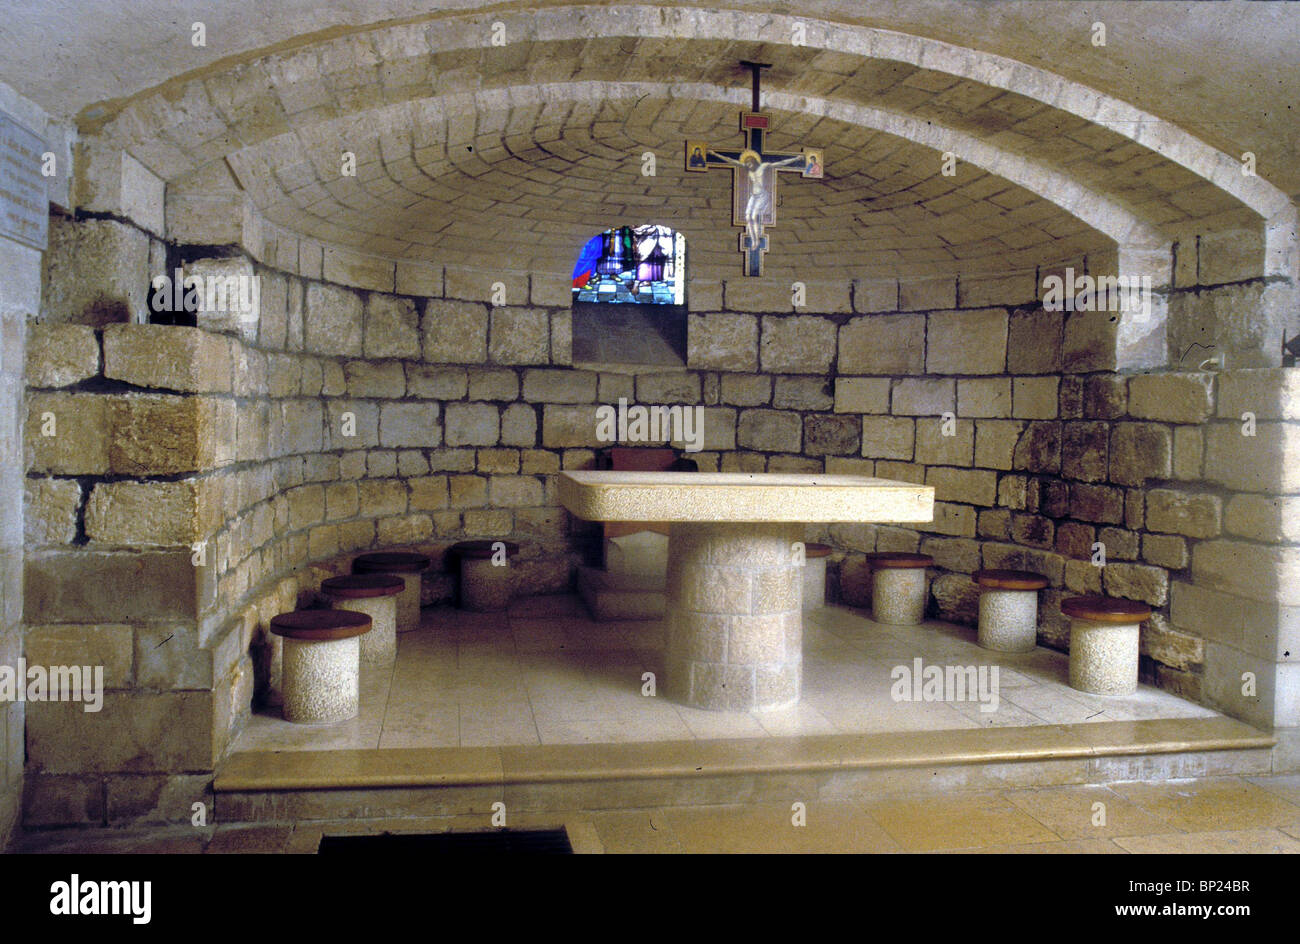 489 NAZARETH, CRYPT OF THE CHURCH OF ST. JOSEPH - Stock Image